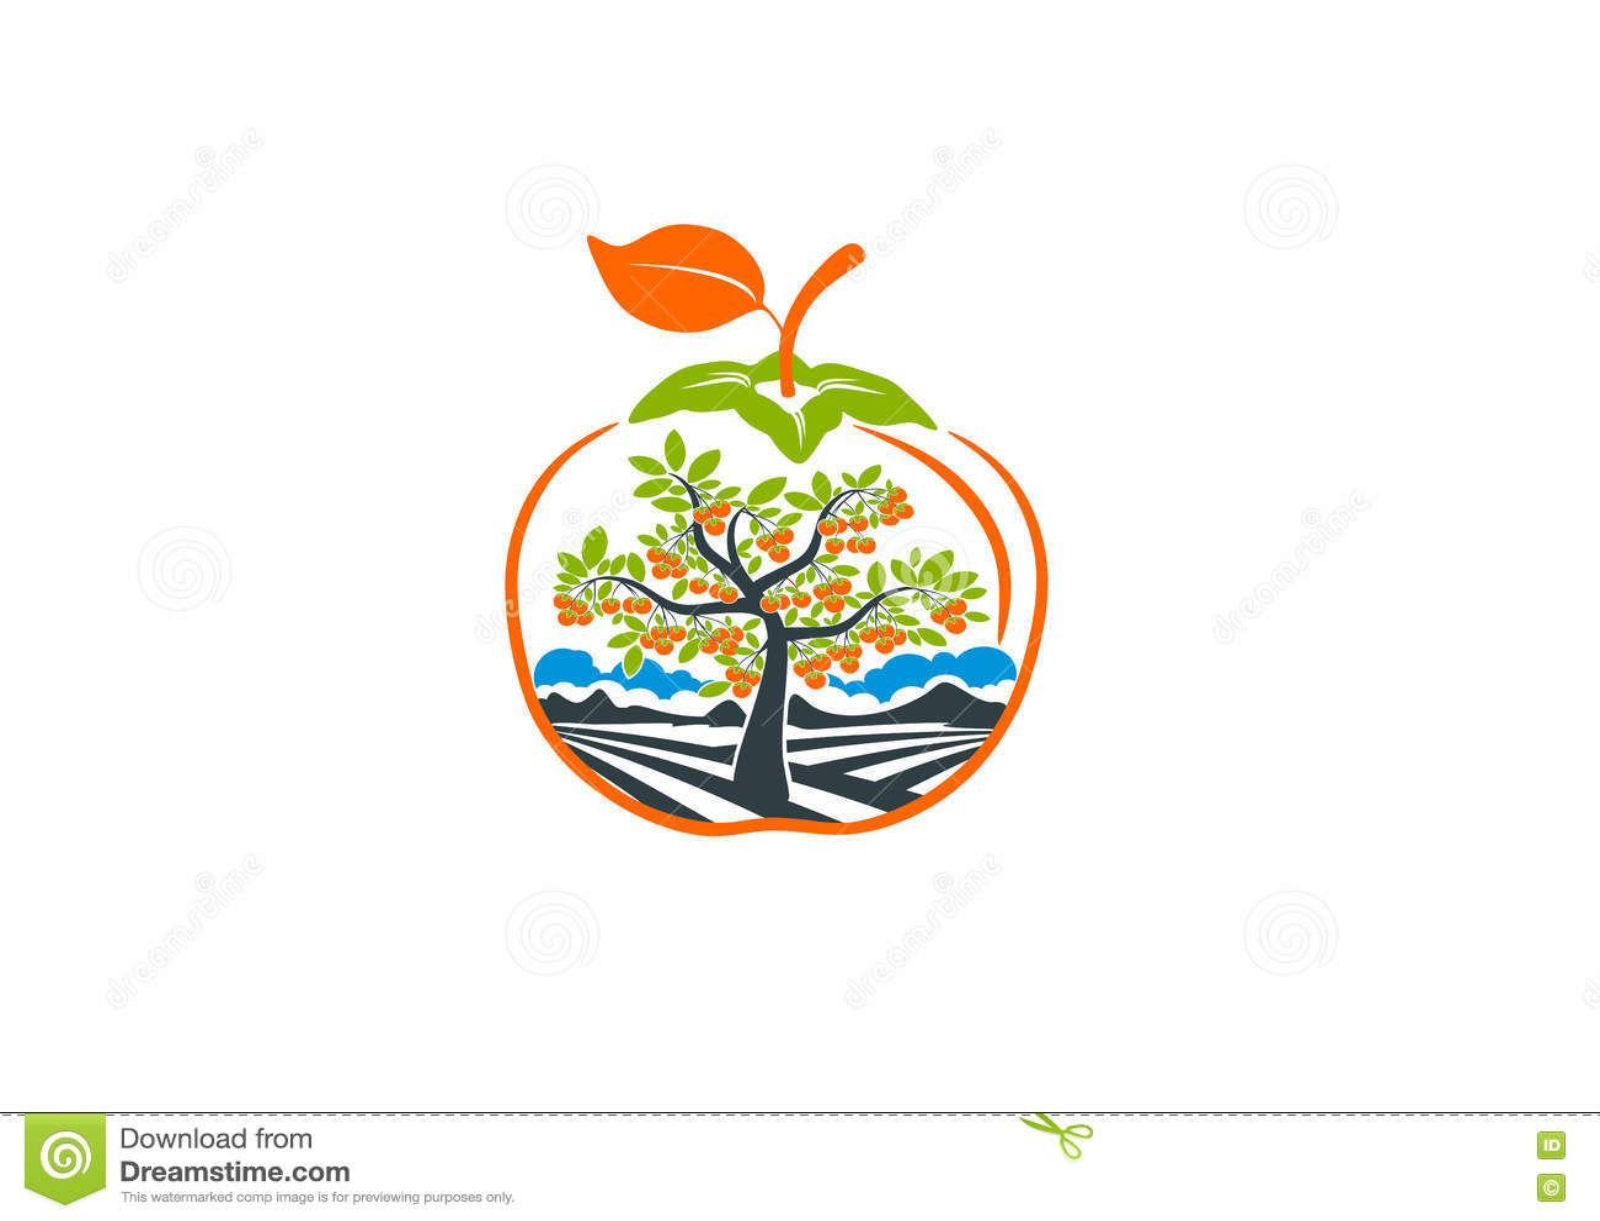 Tree persimmon logo